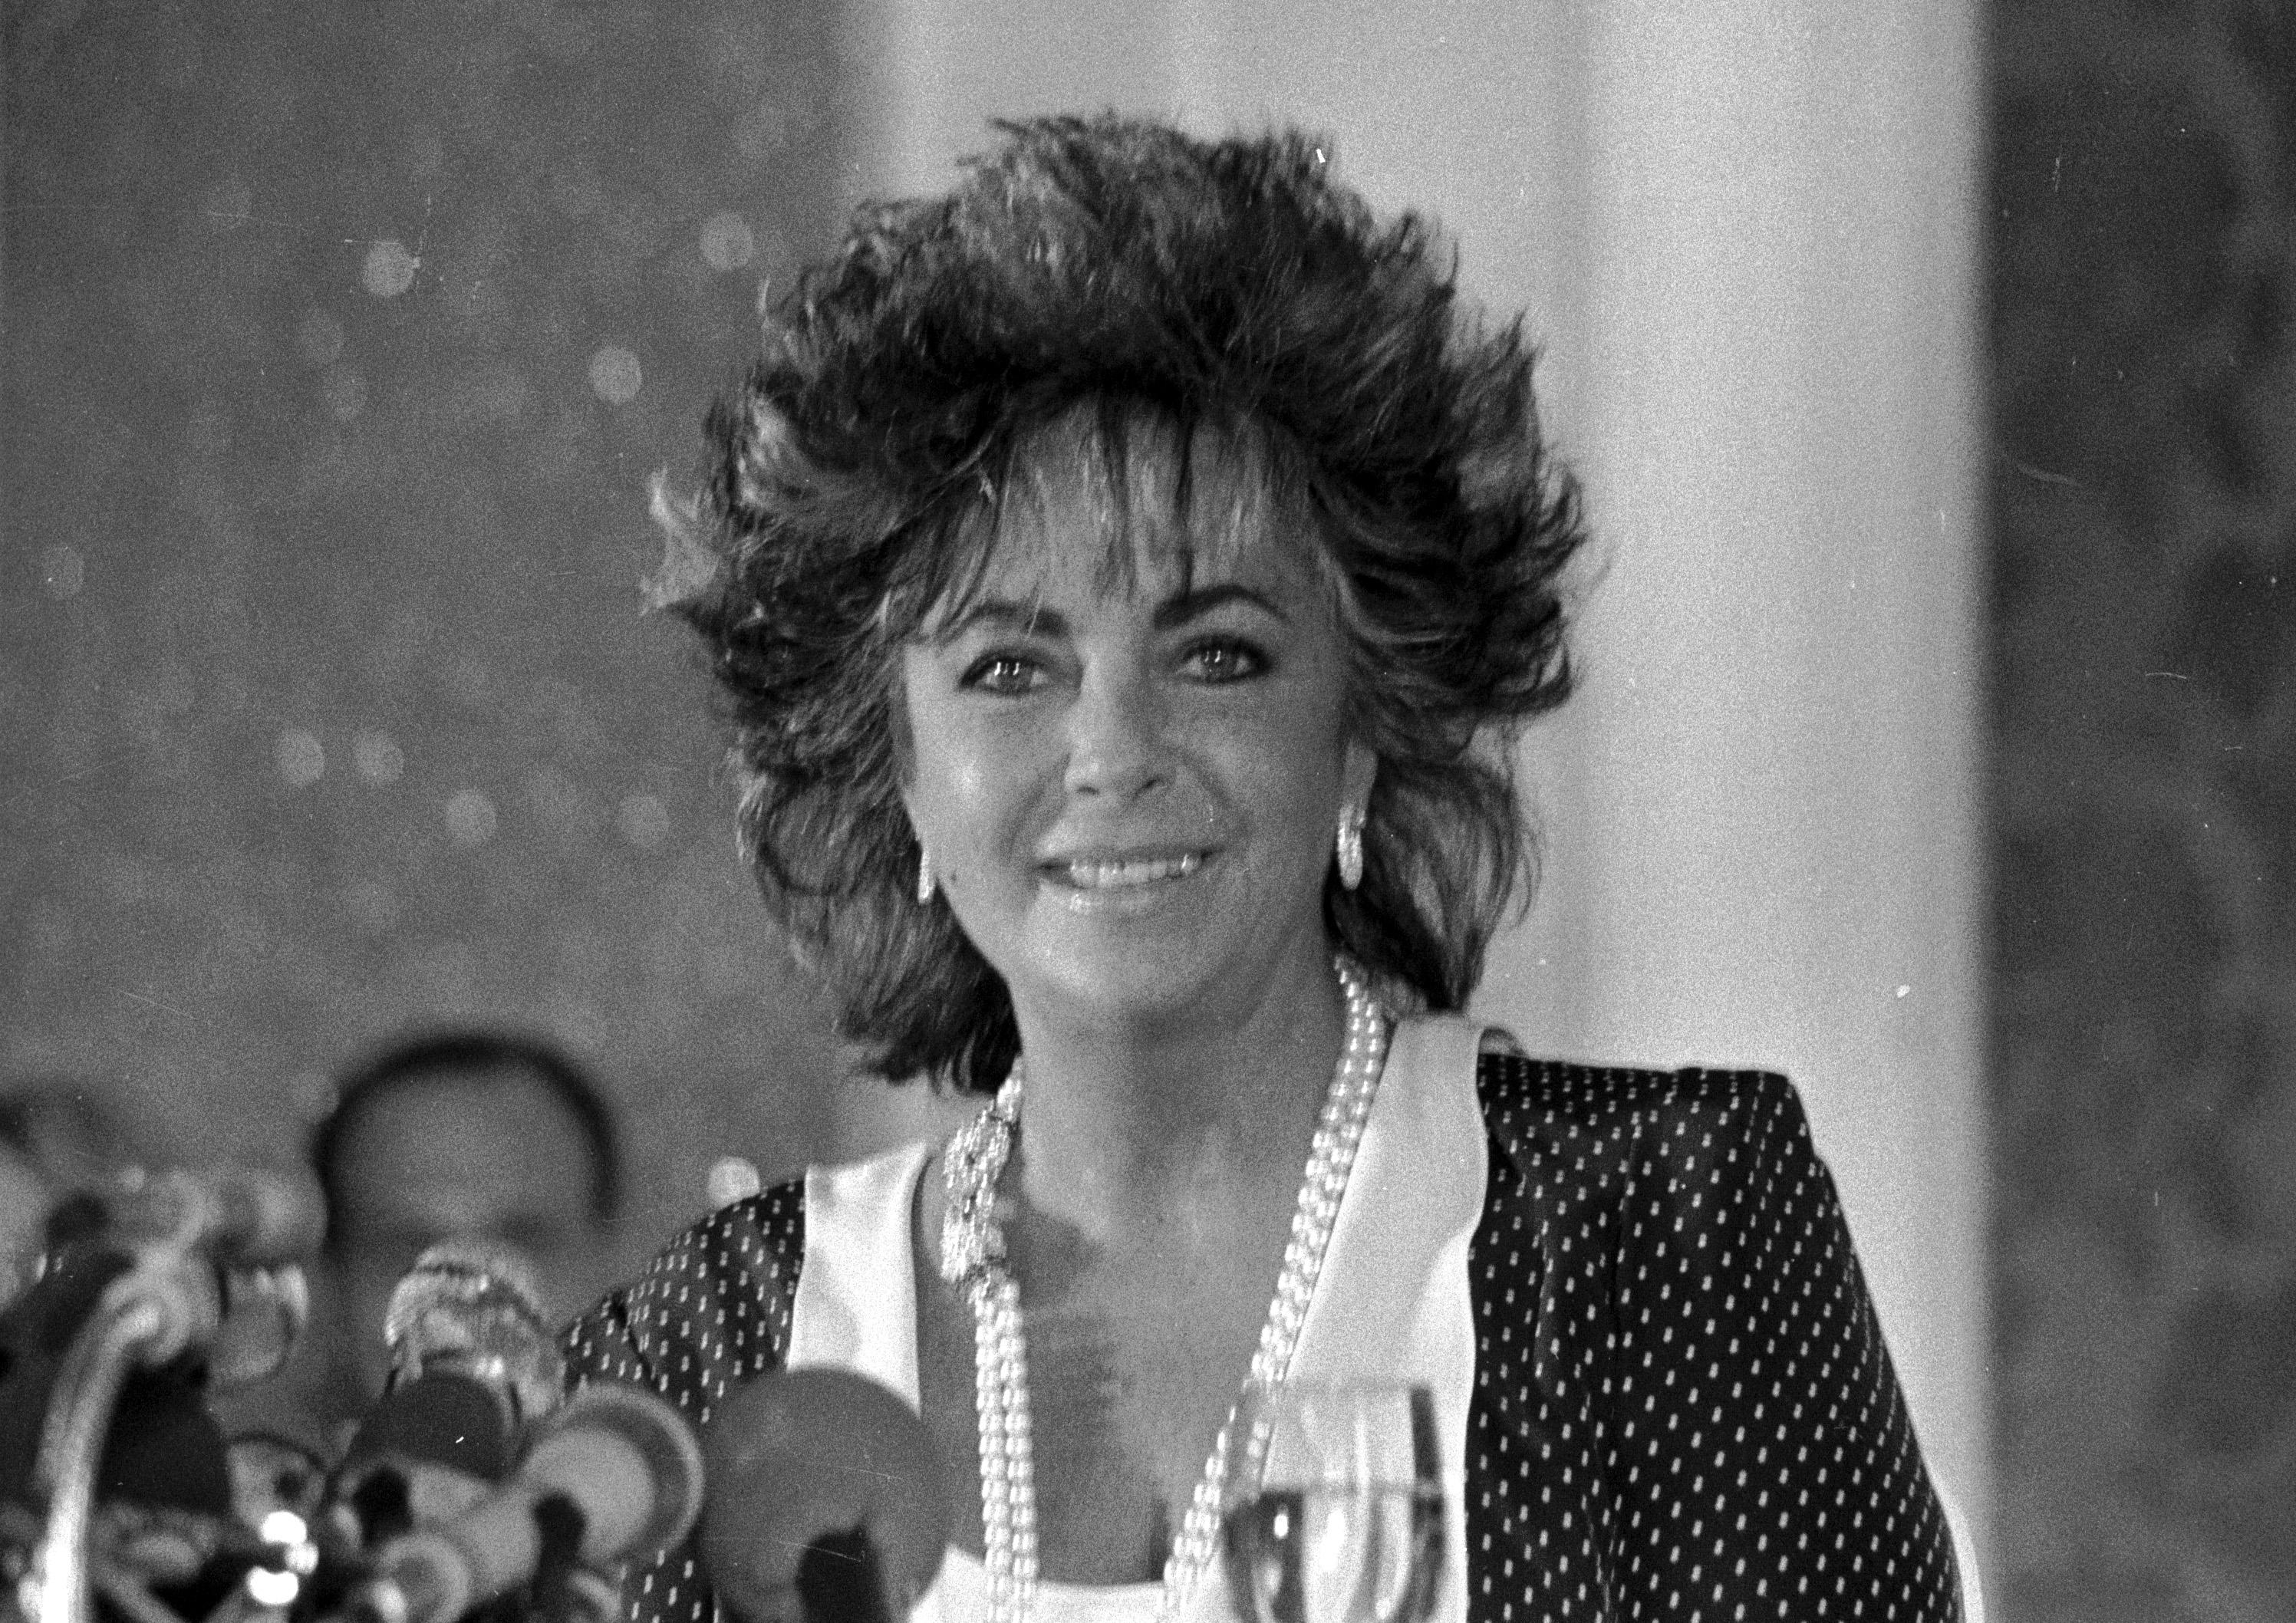 http://upload.wikimedia.org/wikipedia/commons/1/15/Elizabeth_Taylor36.JPG